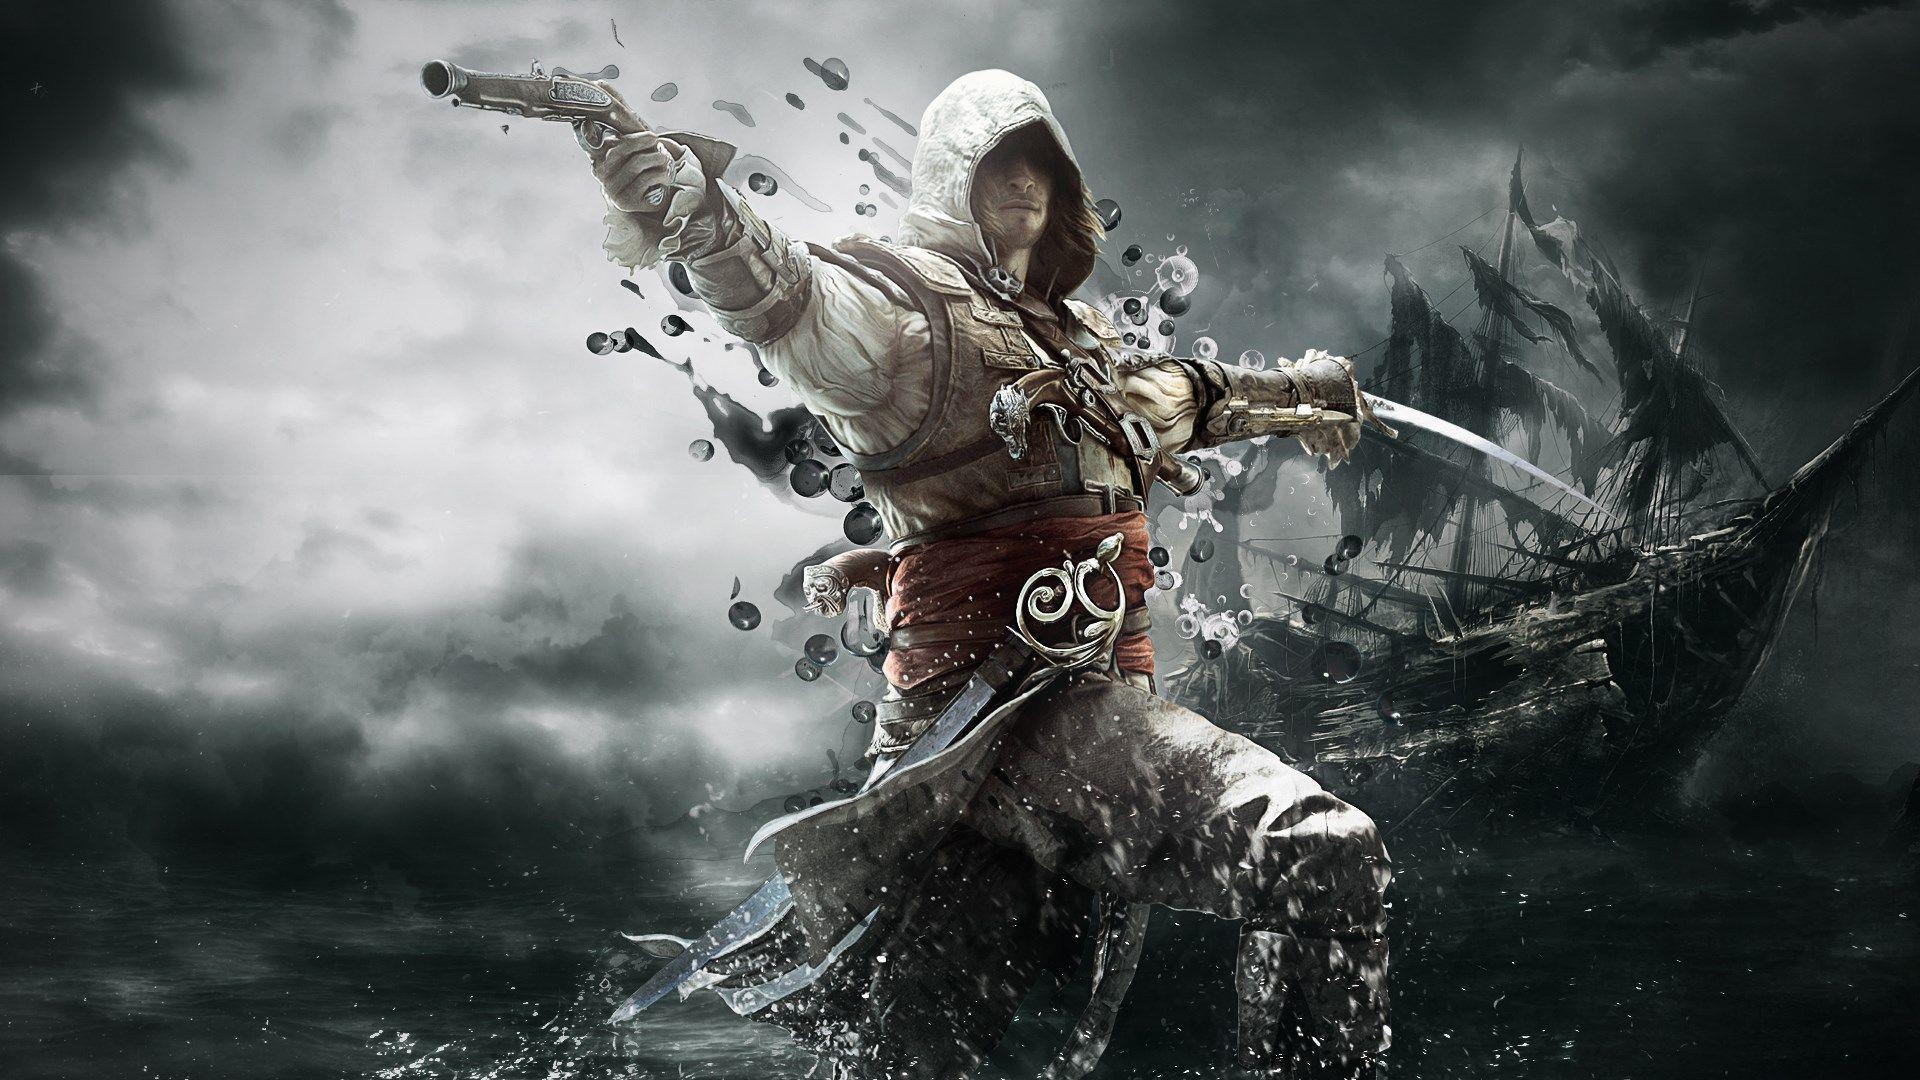 City Wallpaper Full Hd 1920x1080 Free Wallpaper Full Hd 1080p Assassin S Creed Black Assassins Creed Black Flag Assassins Creed